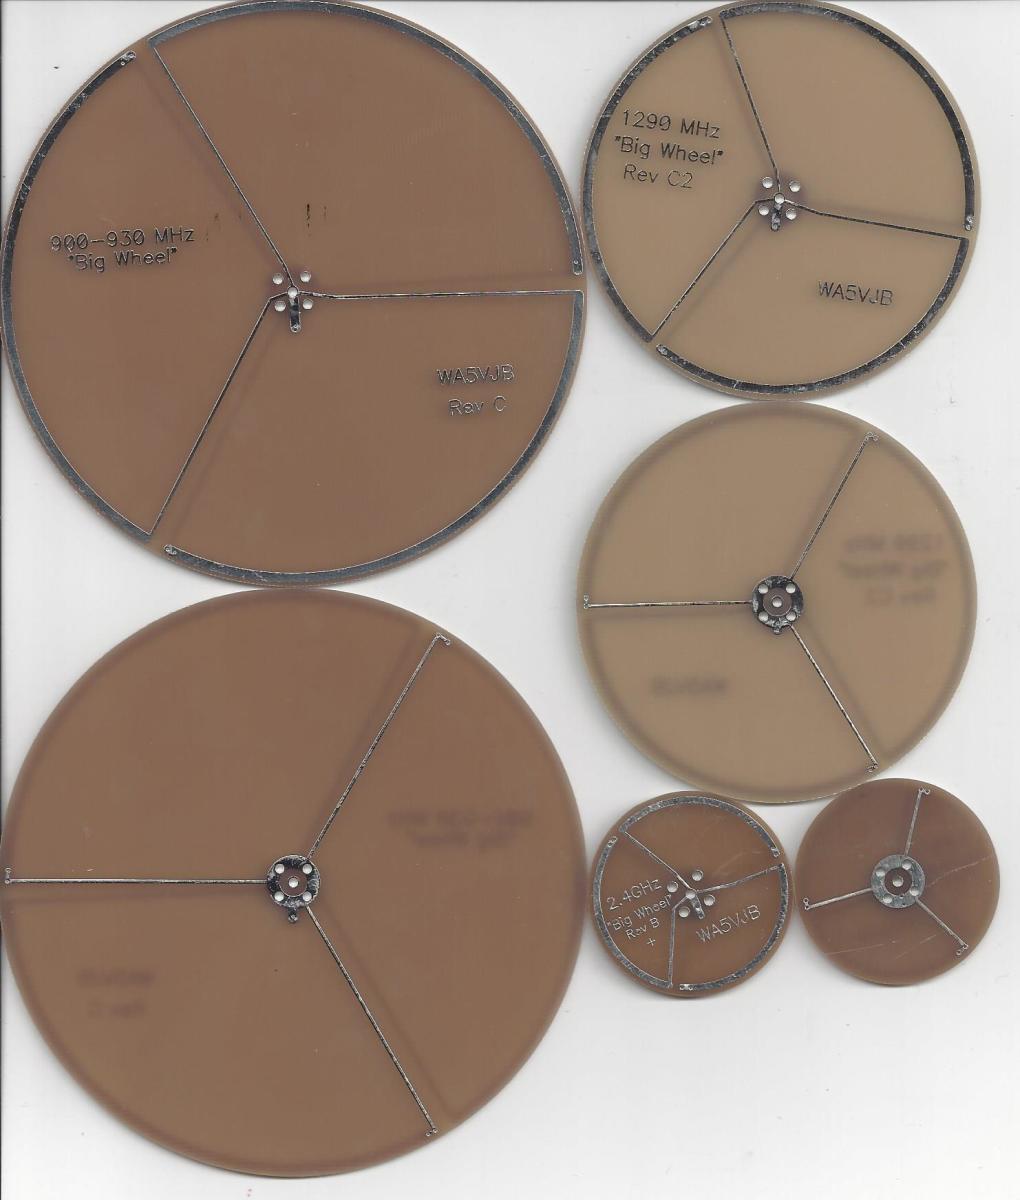 DB8 antennas are omnidirectional, like these wheel antennas.